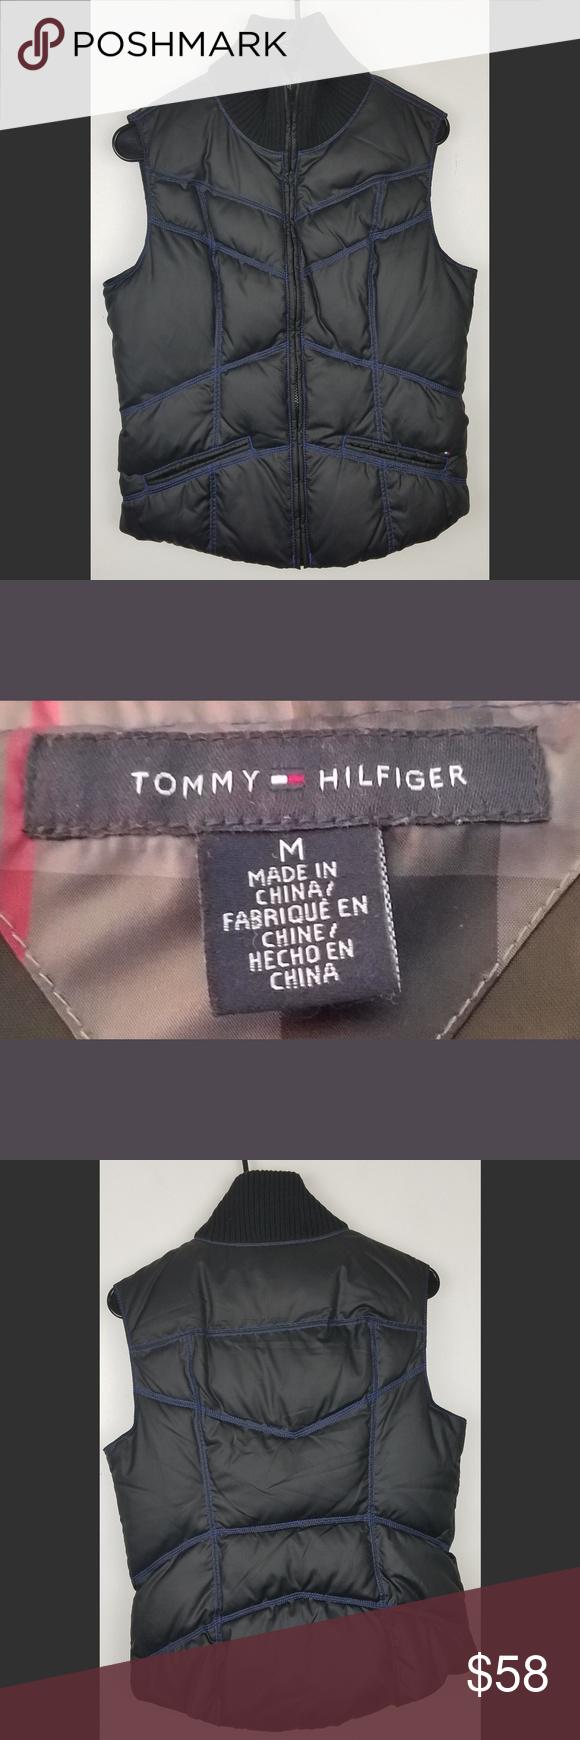 Tommy Hilfiger Down Vest Tommy hilfiger jackets